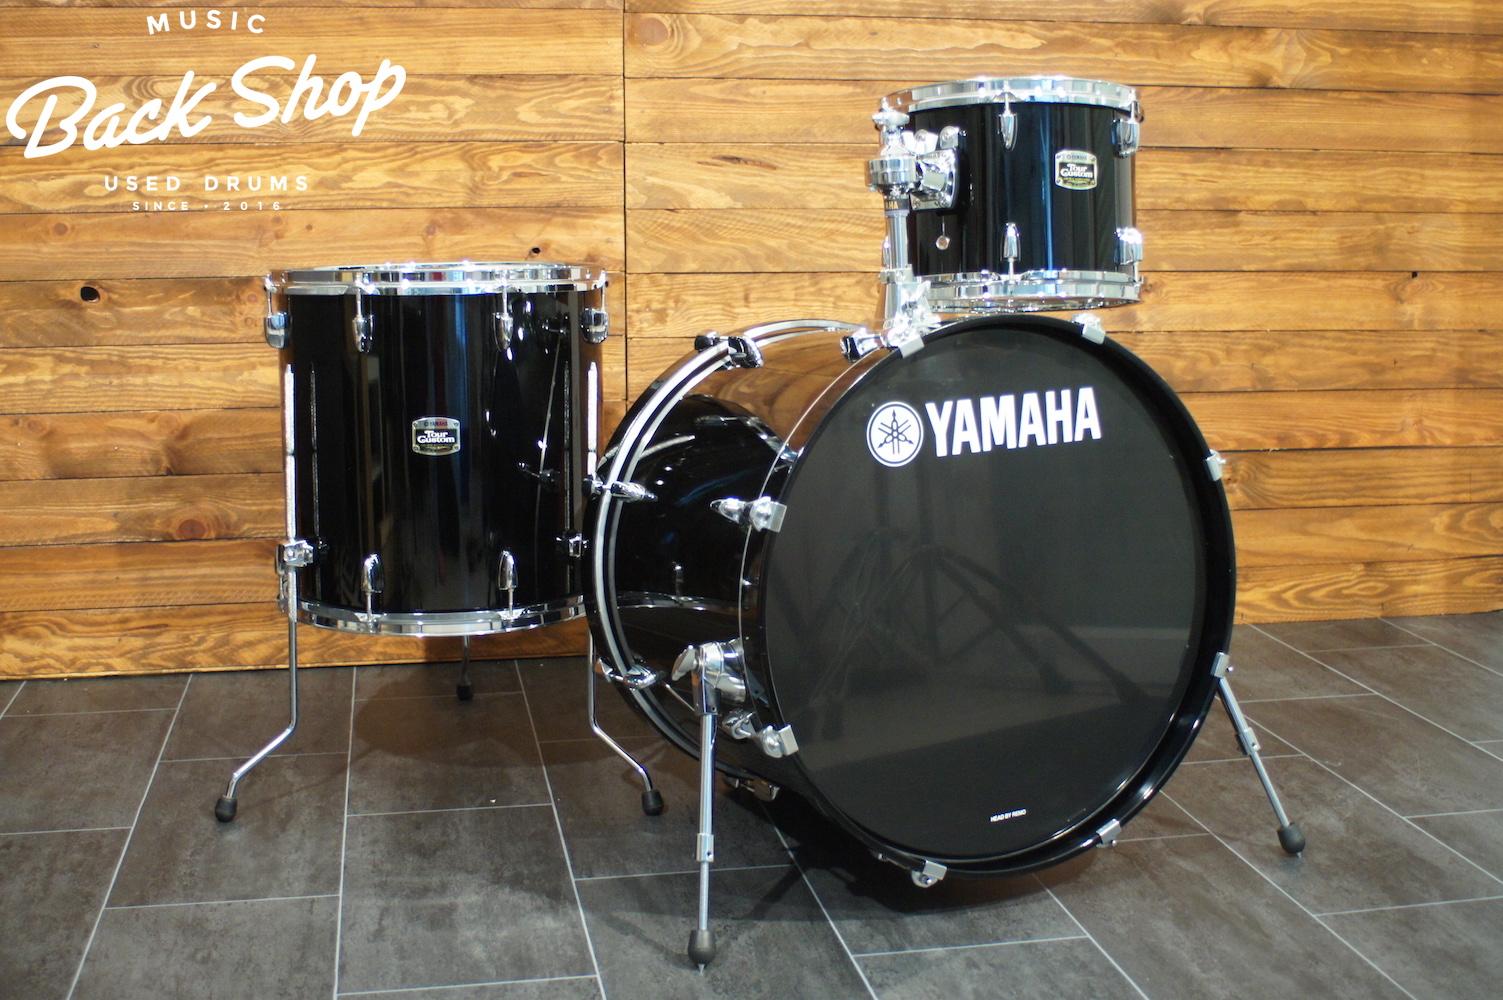 yamaha tour custom image 1838573 audiofanzine. Black Bedroom Furniture Sets. Home Design Ideas